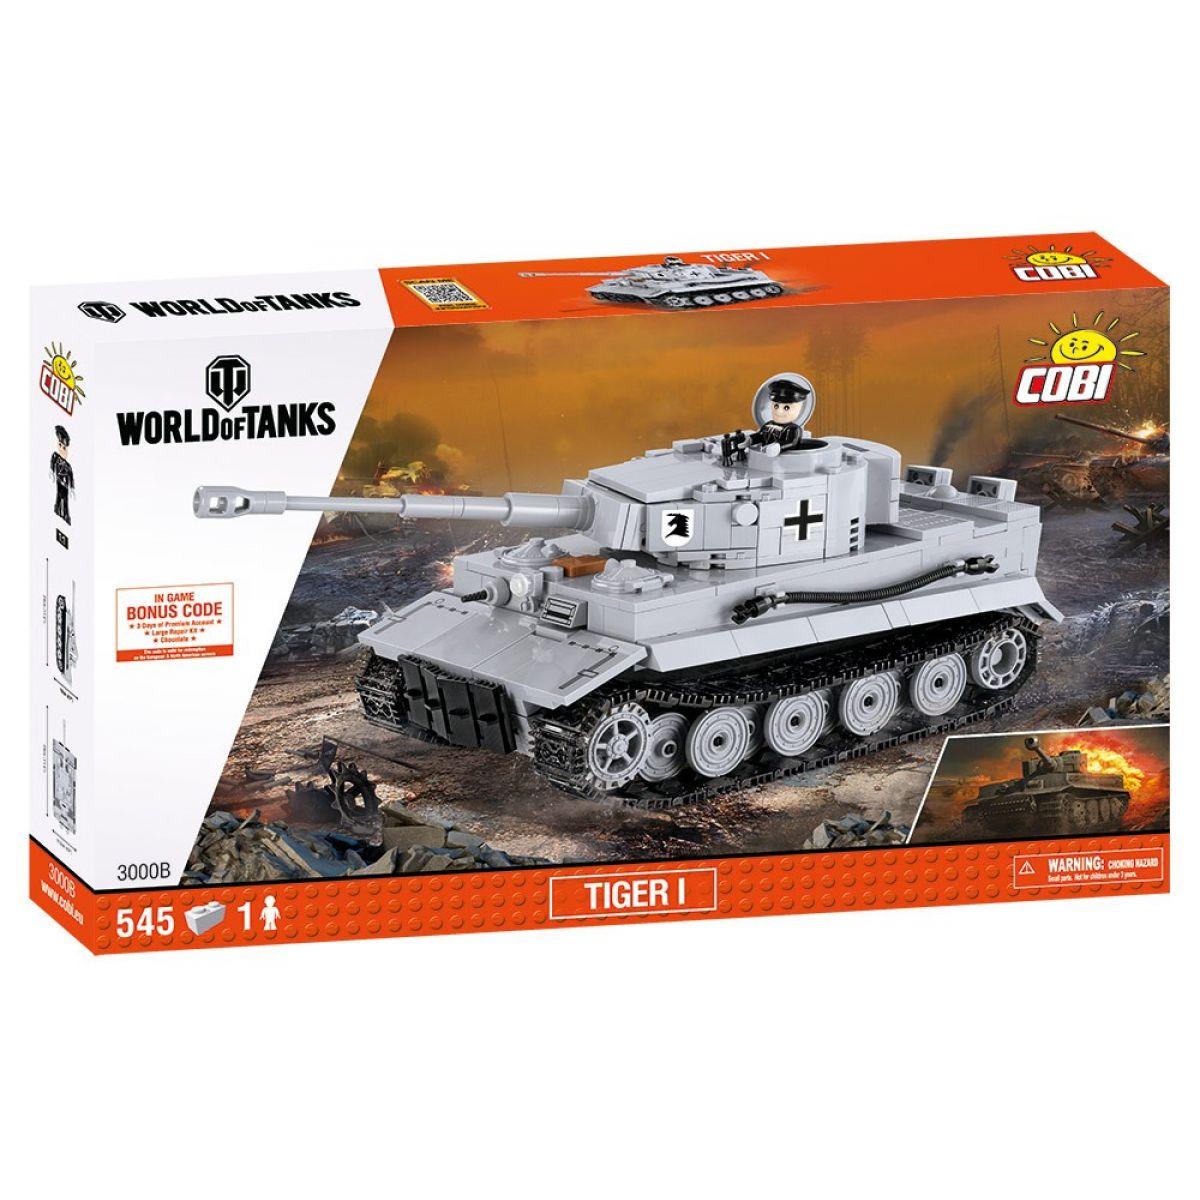 Cobi Malá armáda 3000B World of Tanks Tiger I  - Poškozený obal